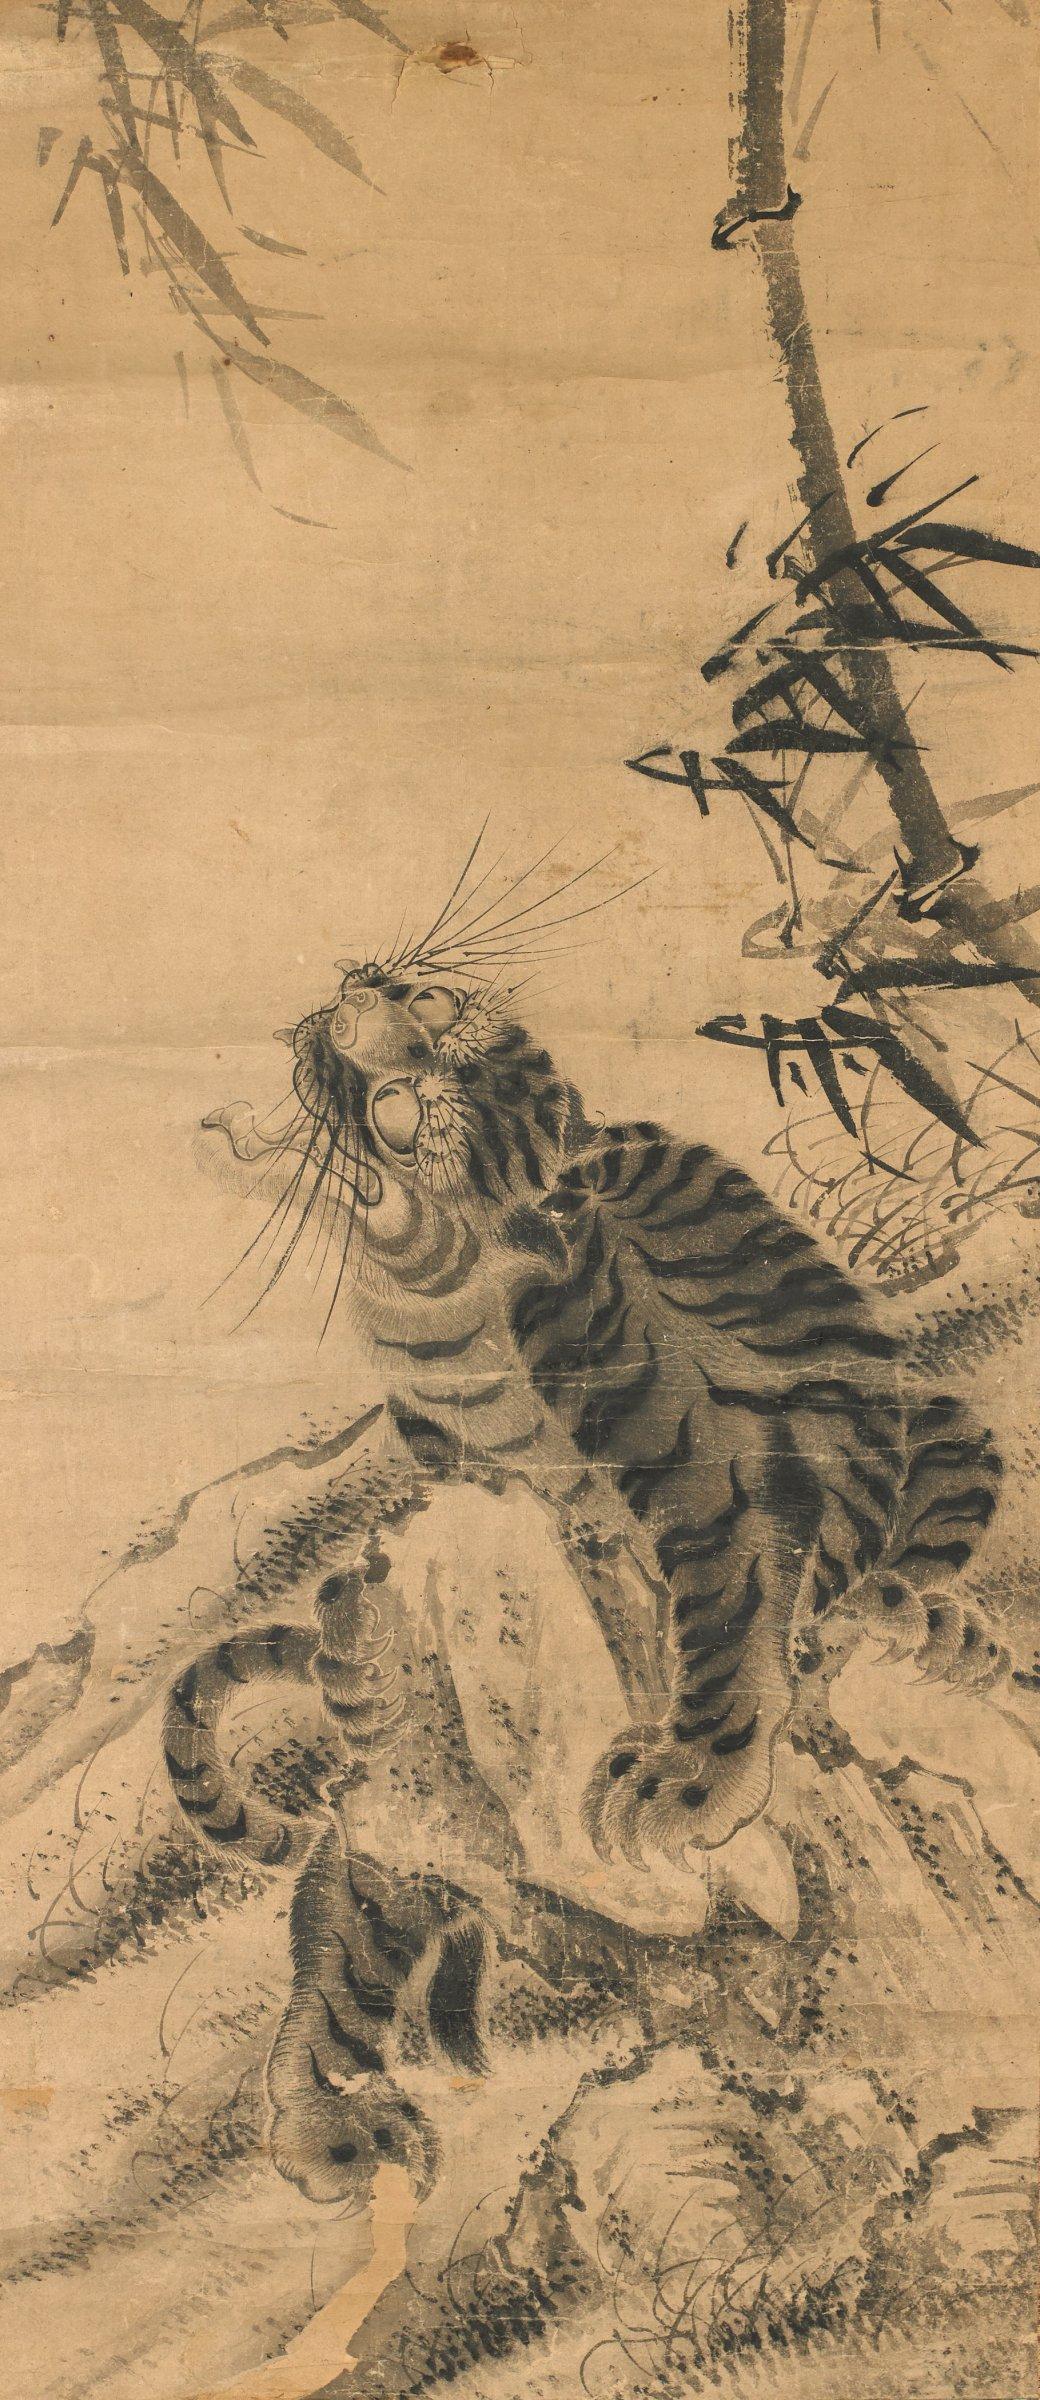 Tiger, Japan, Copy after Sesson (later copy), ink on paper